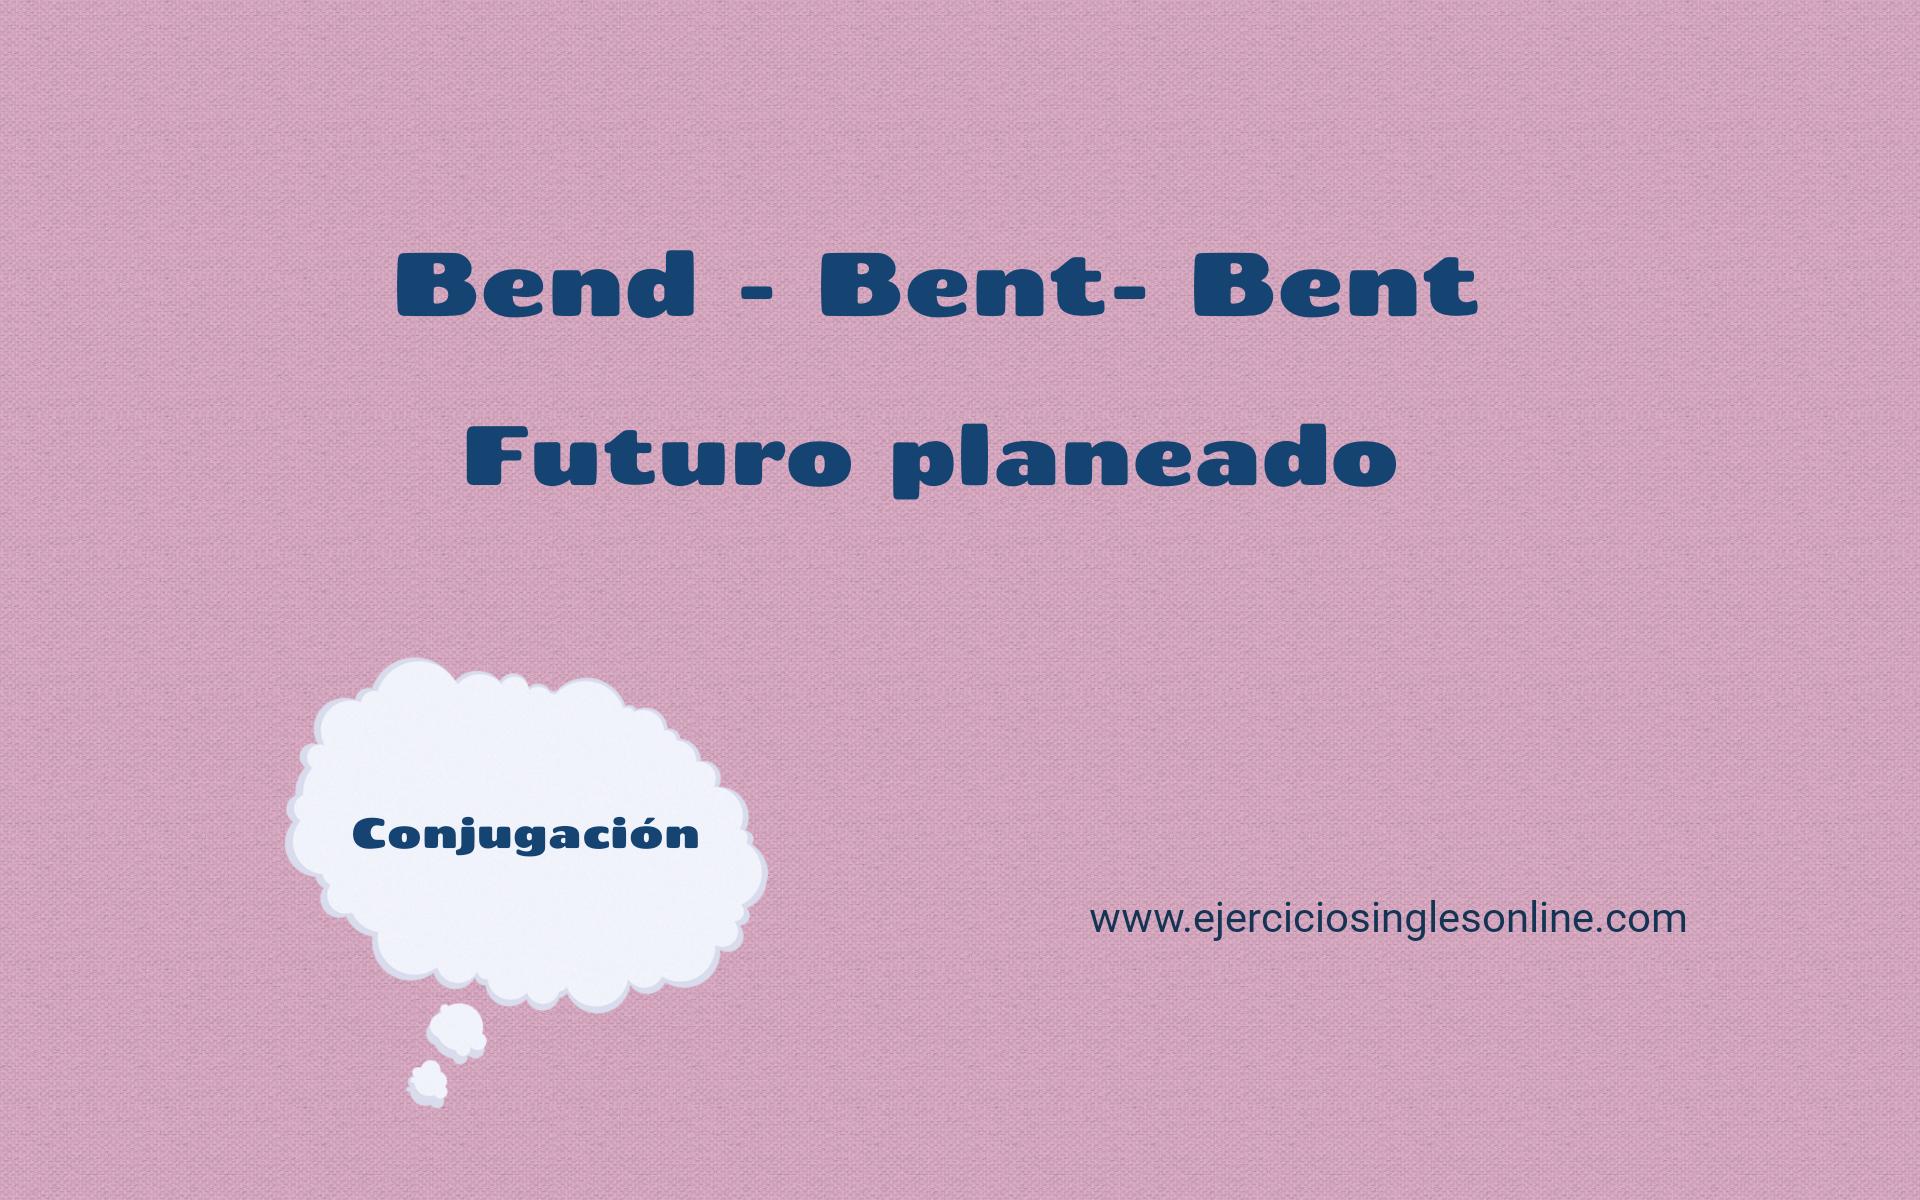 Bend - Futuro planeado